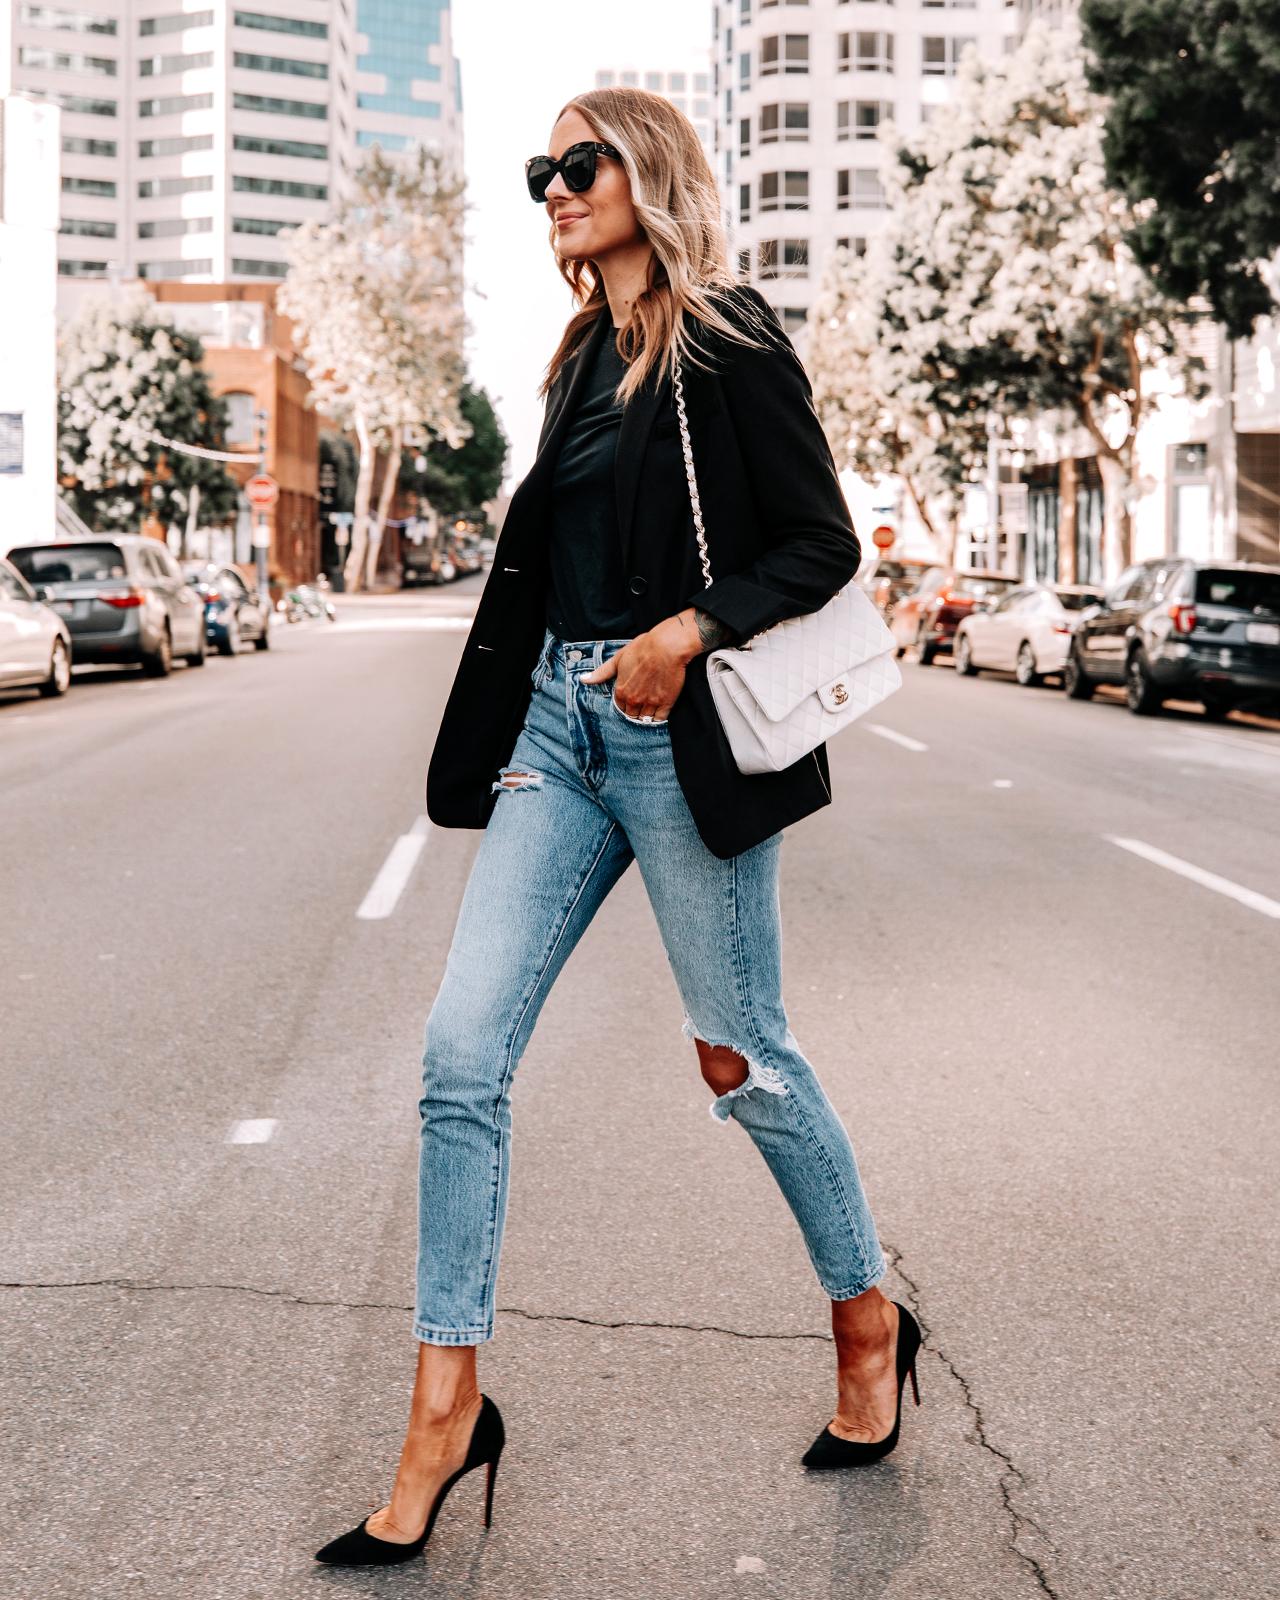 Fashion Jackson Wearing Black Blazer Levis Ripped Jeans Black Heels Street Style